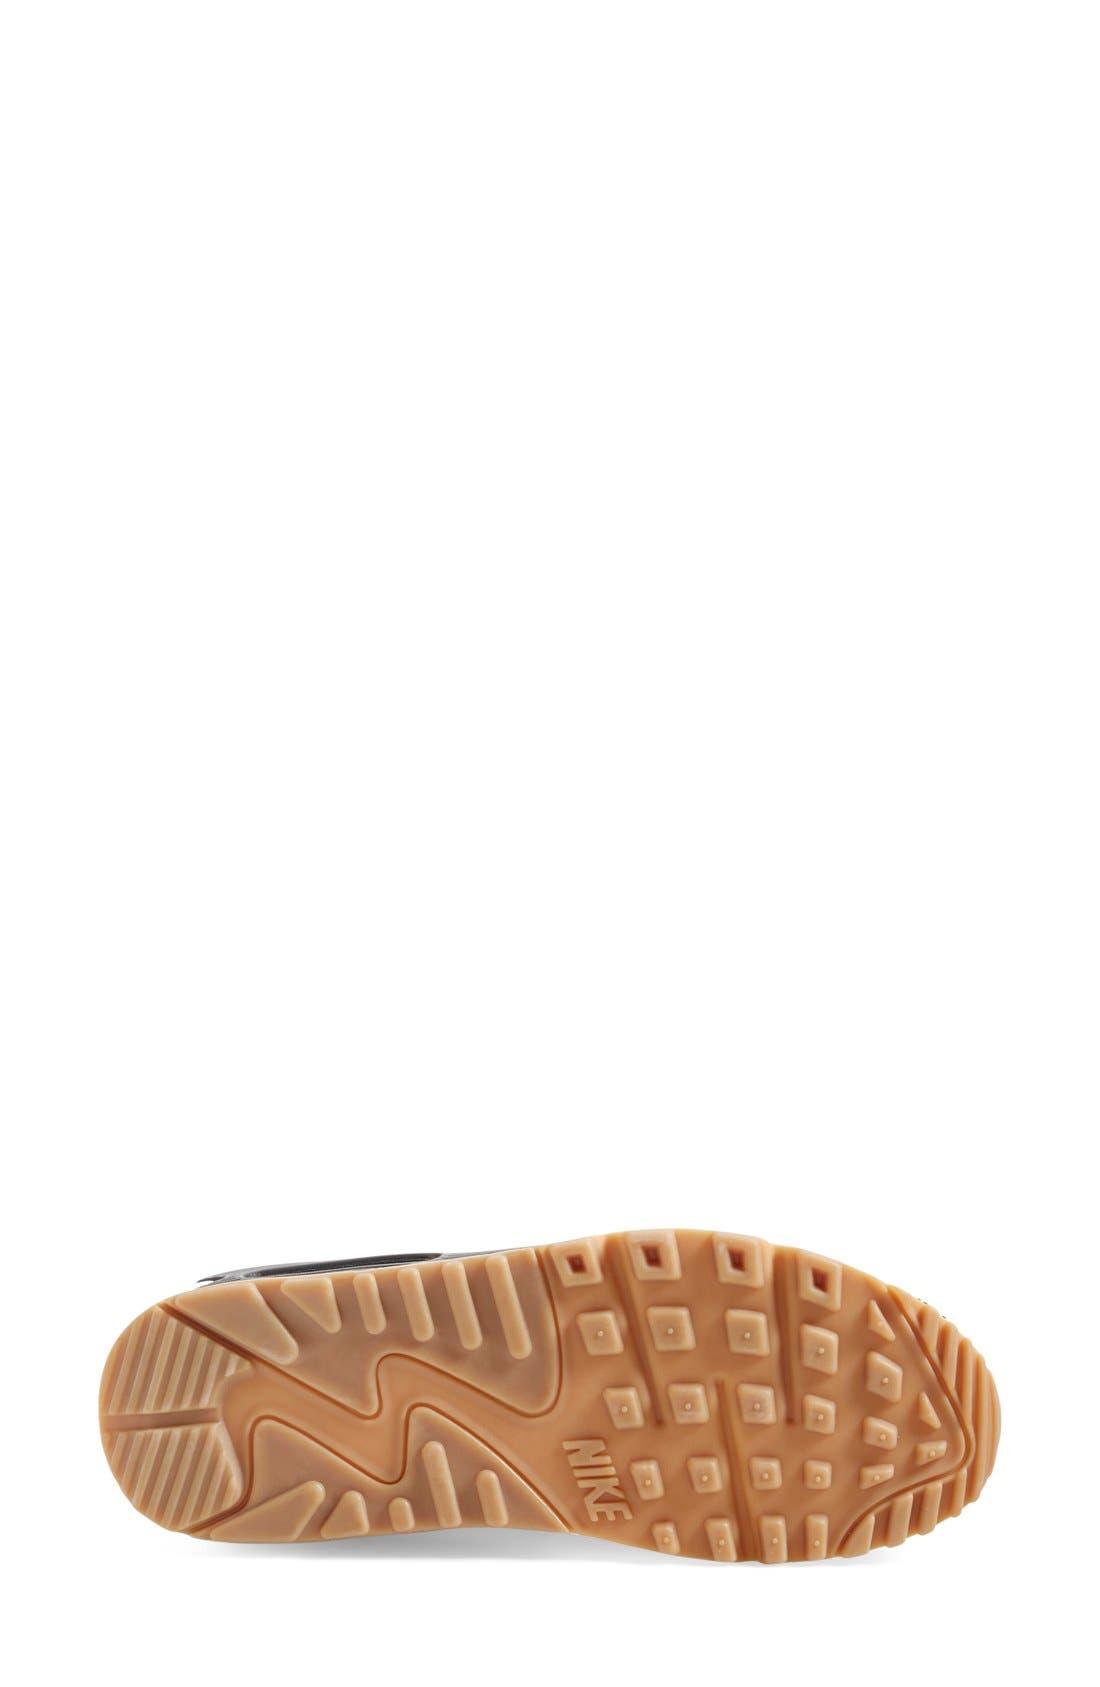 'Air Max 90 - Premium' Sneaker,                             Alternate thumbnail 4, color,                             White/ Black/ Brown